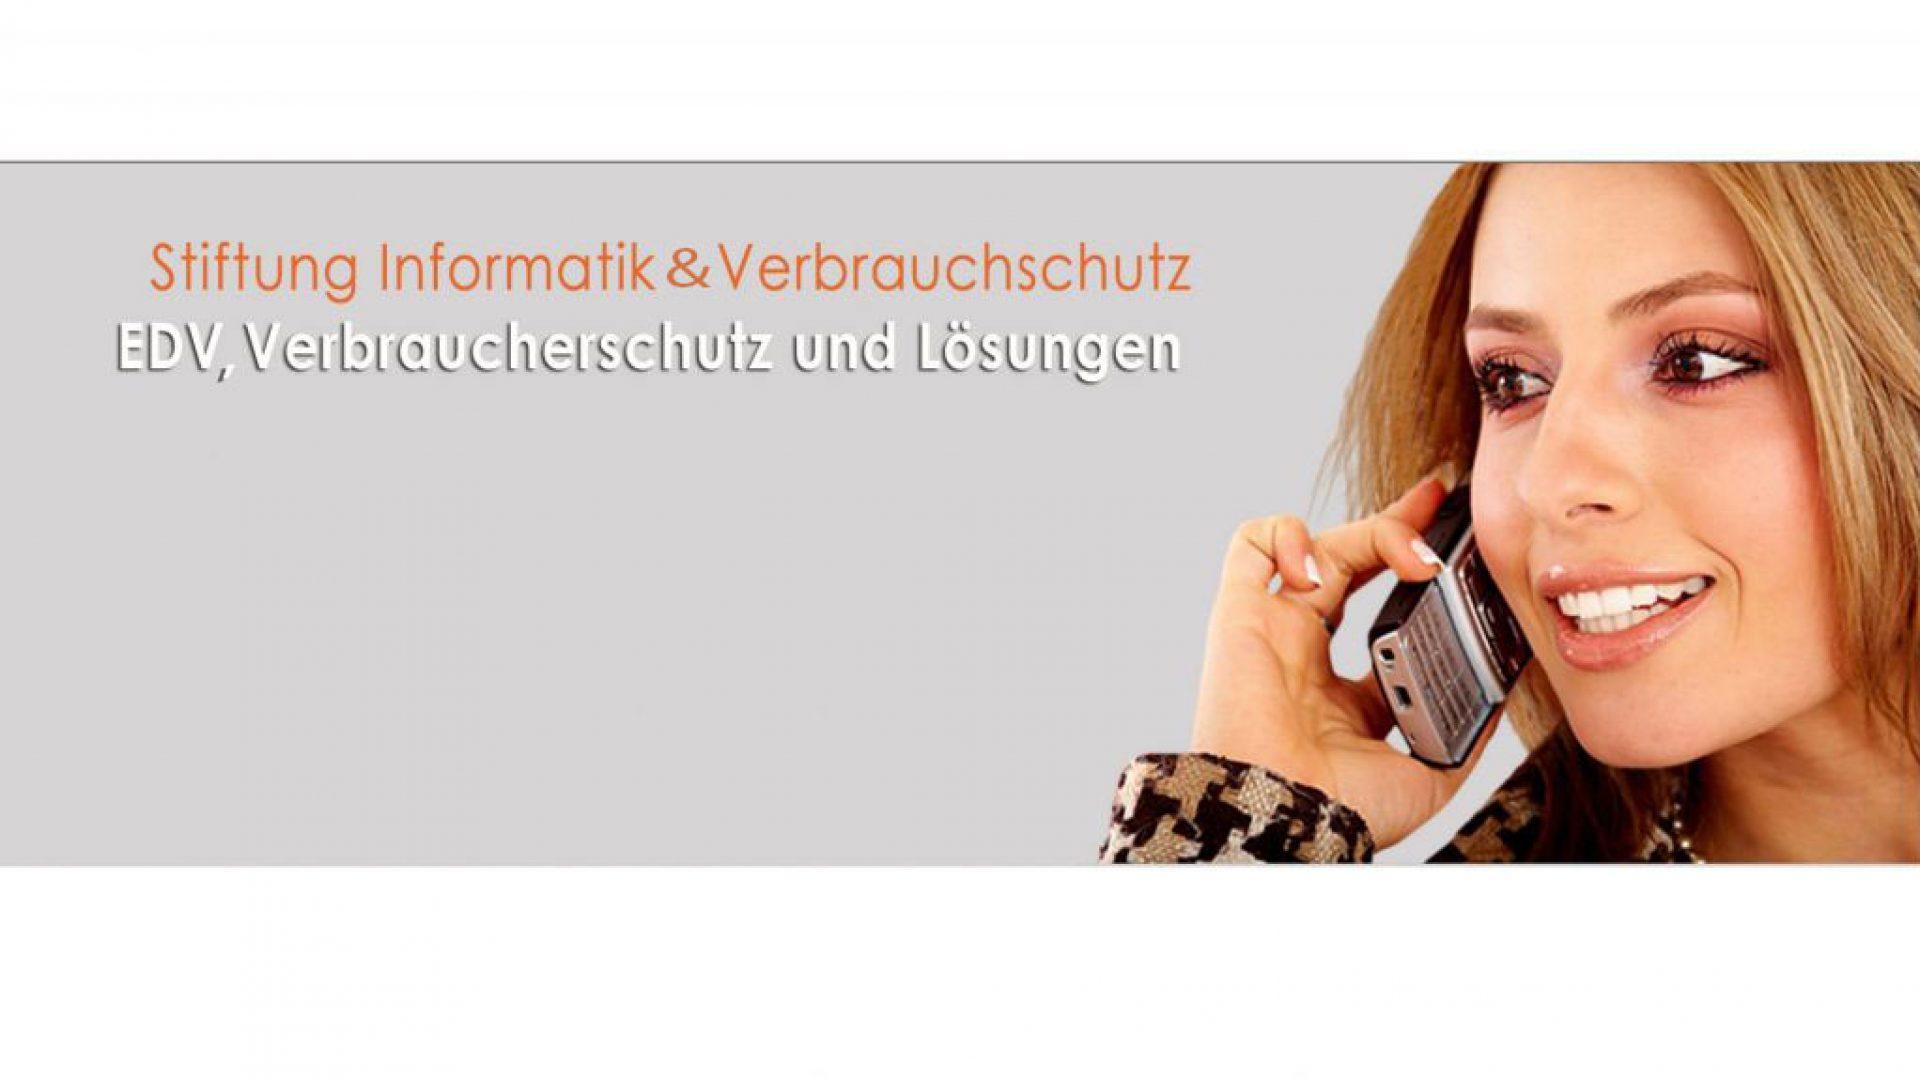 Stiftung Informatik & Verbrauchschutz